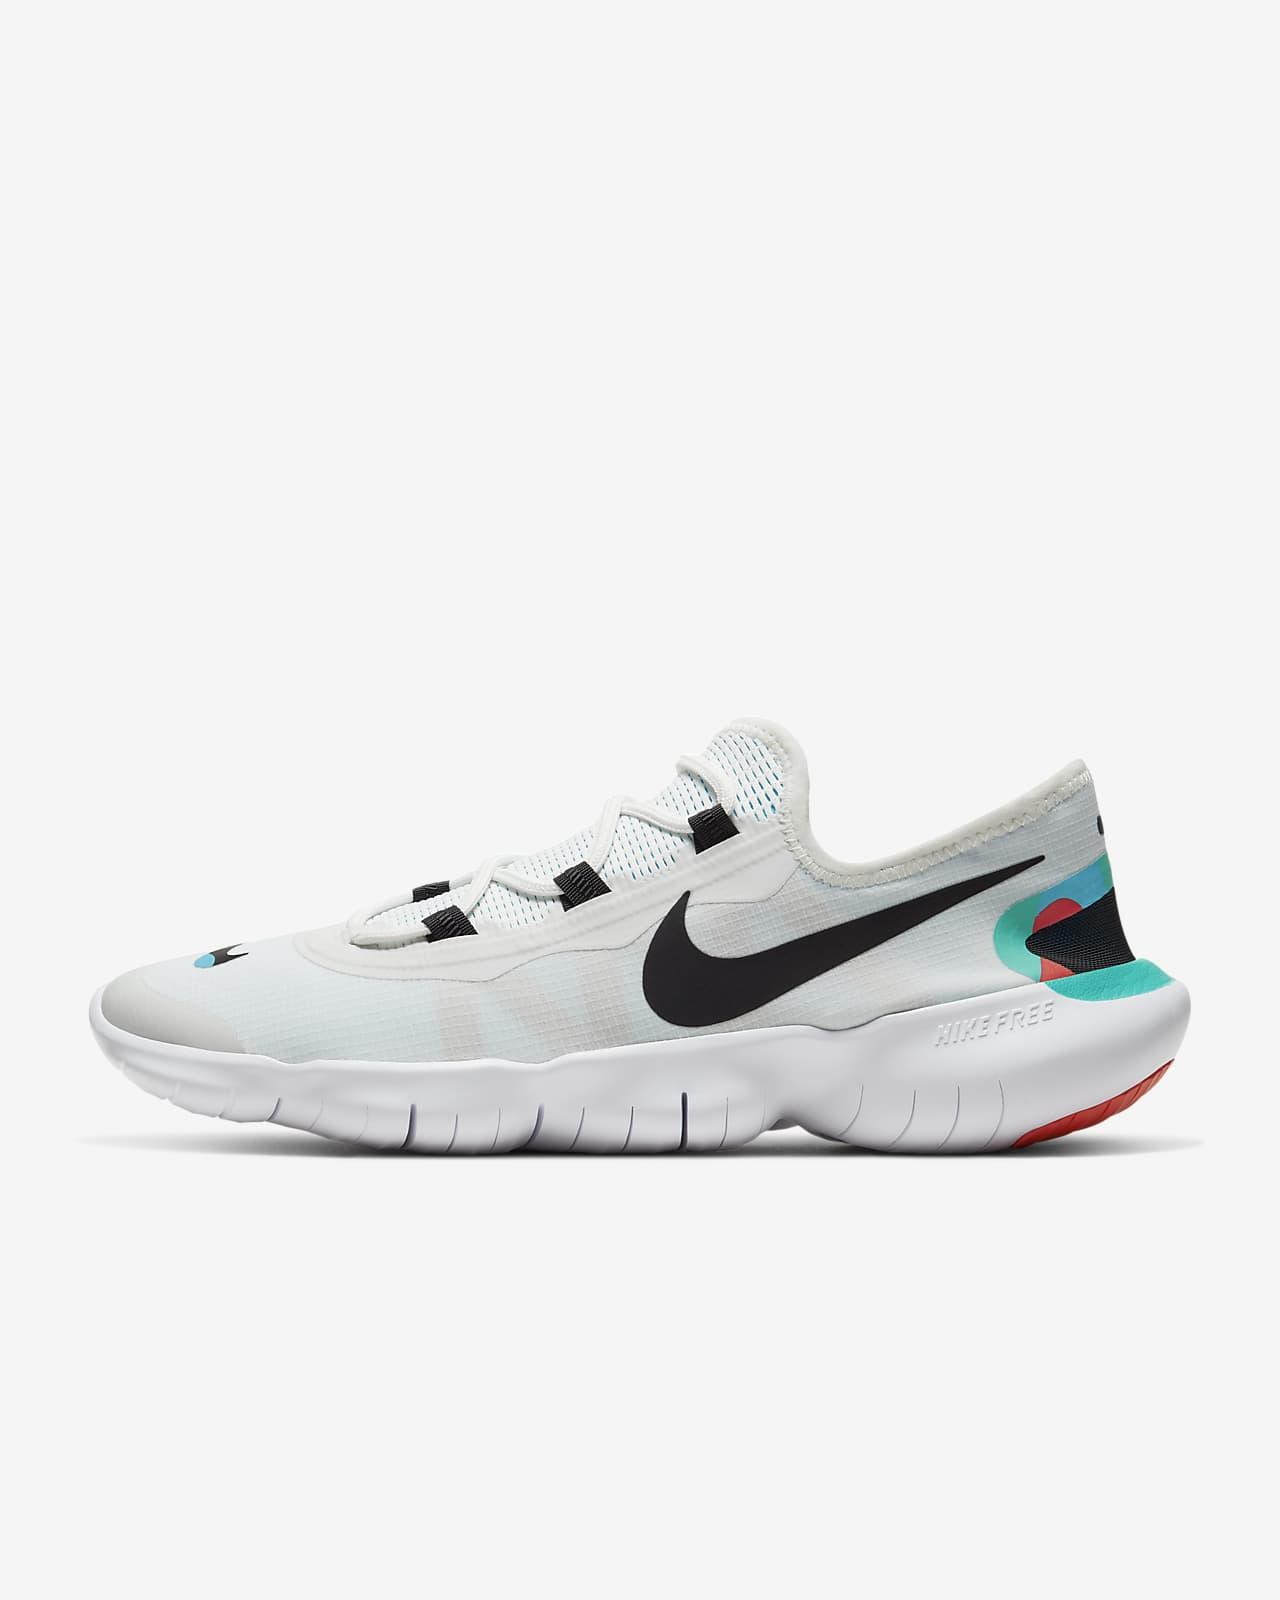 Calzado de running para hombre Nike Free RN 5.0 2020